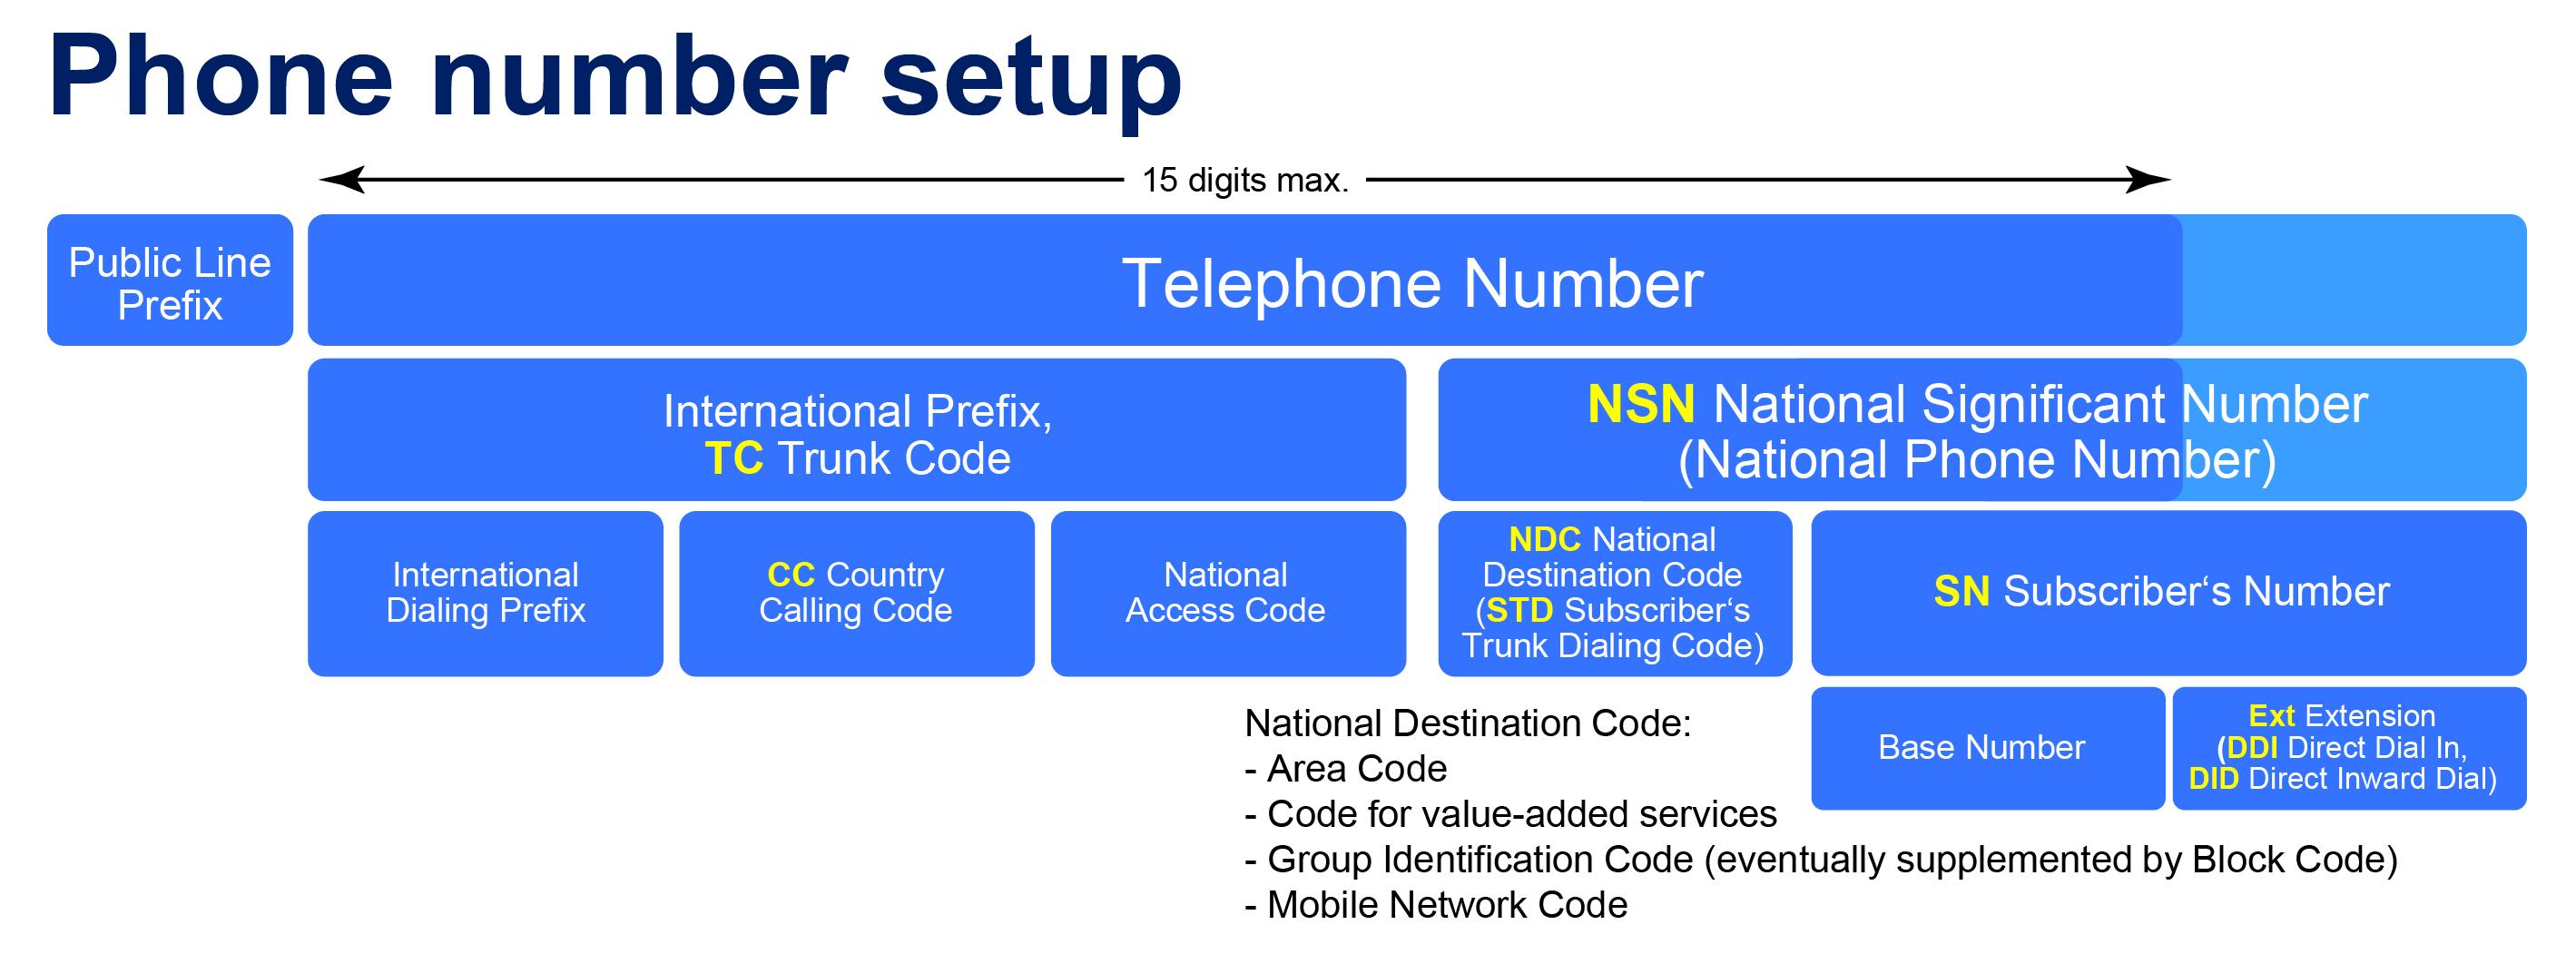 heelementsofatelephonenumber